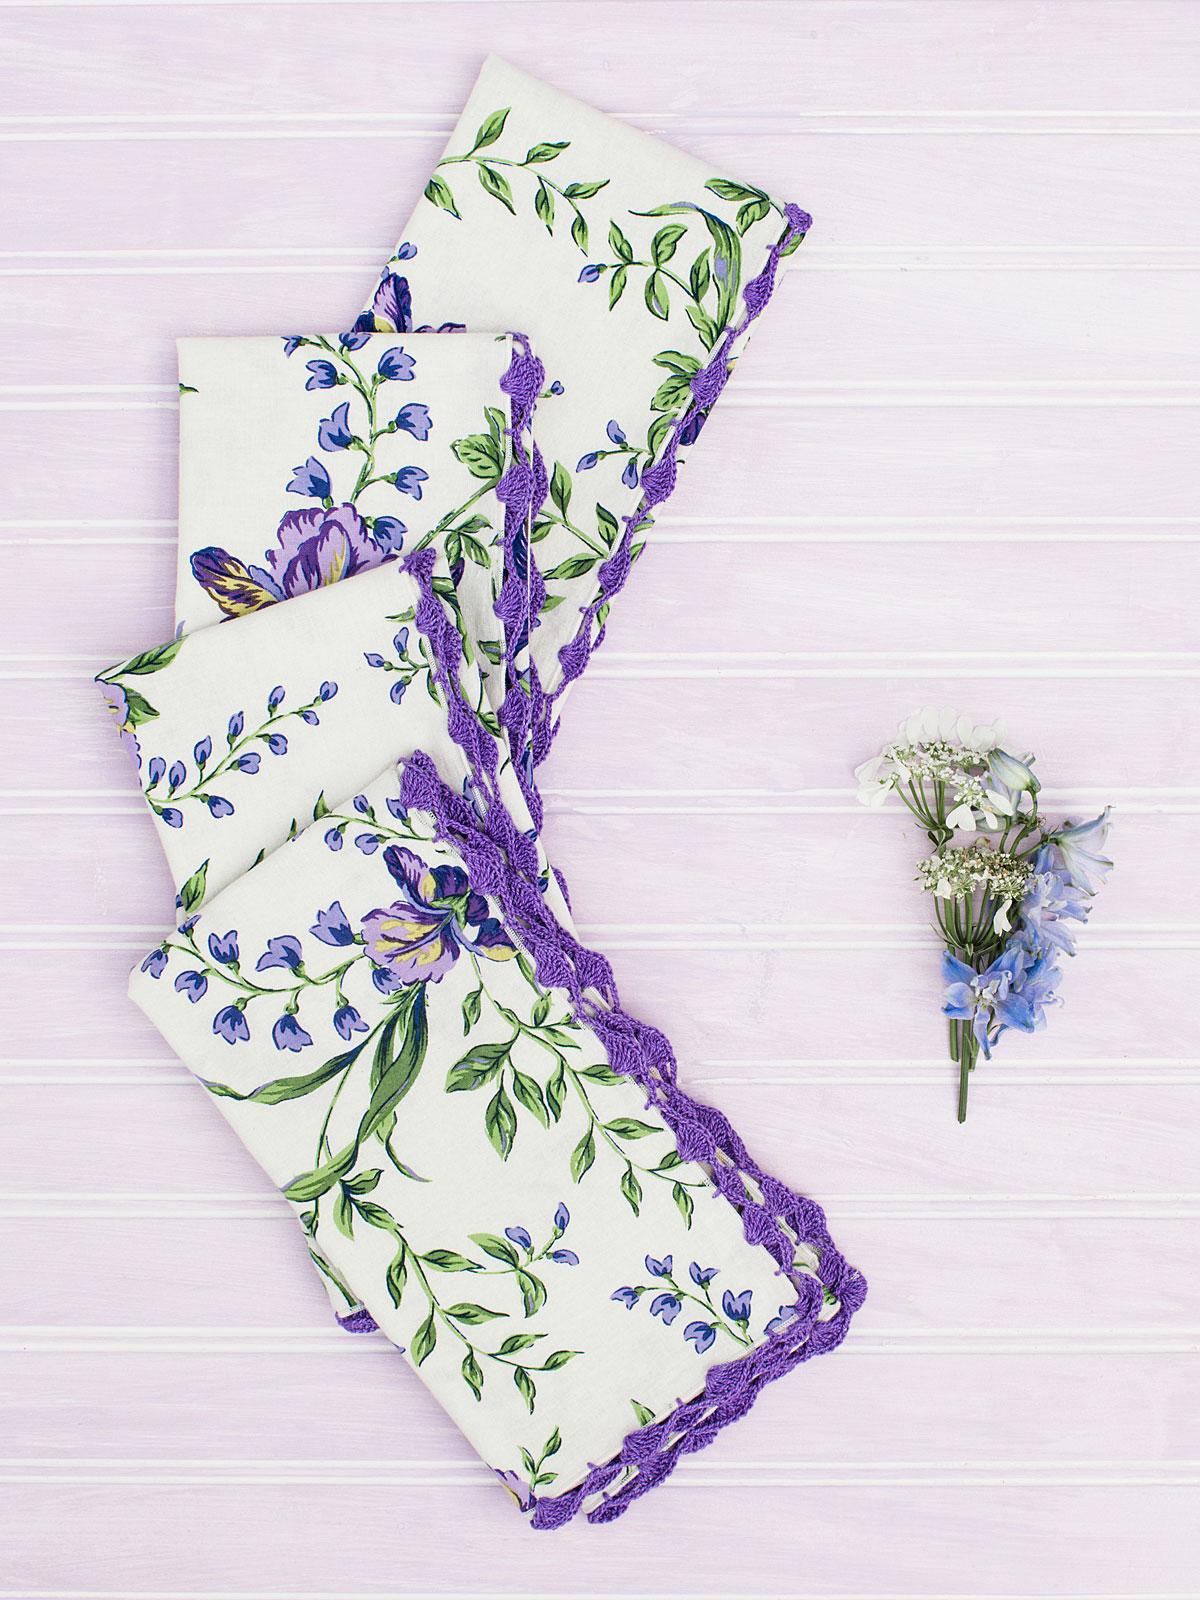 Irresistible Iris Crochet Napkin Set of 4